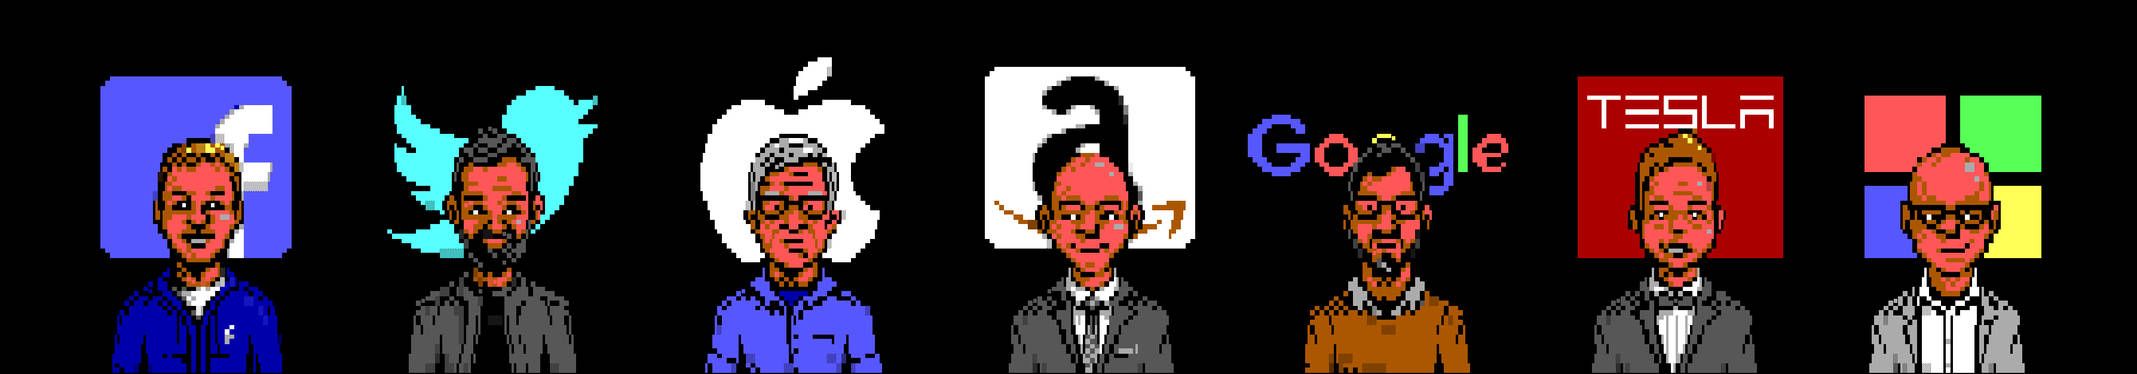 8-bit Tech CEOs Portraits by enzo